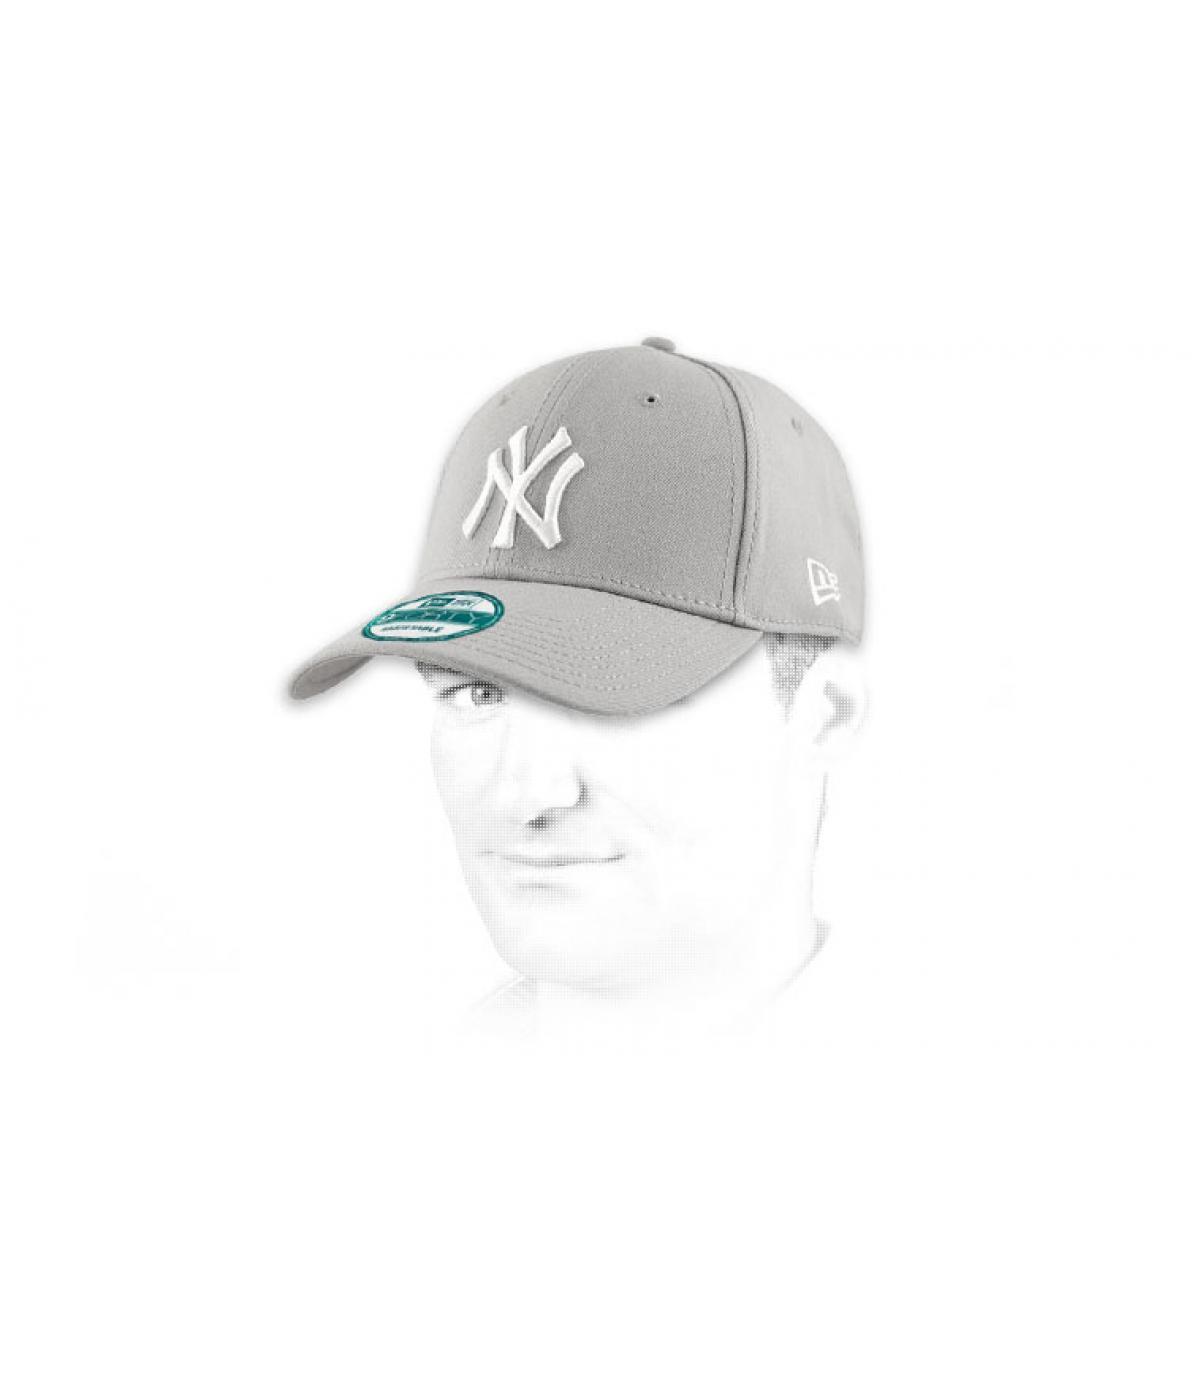 Dettagli League Ess NY 9forty grey white - image 5